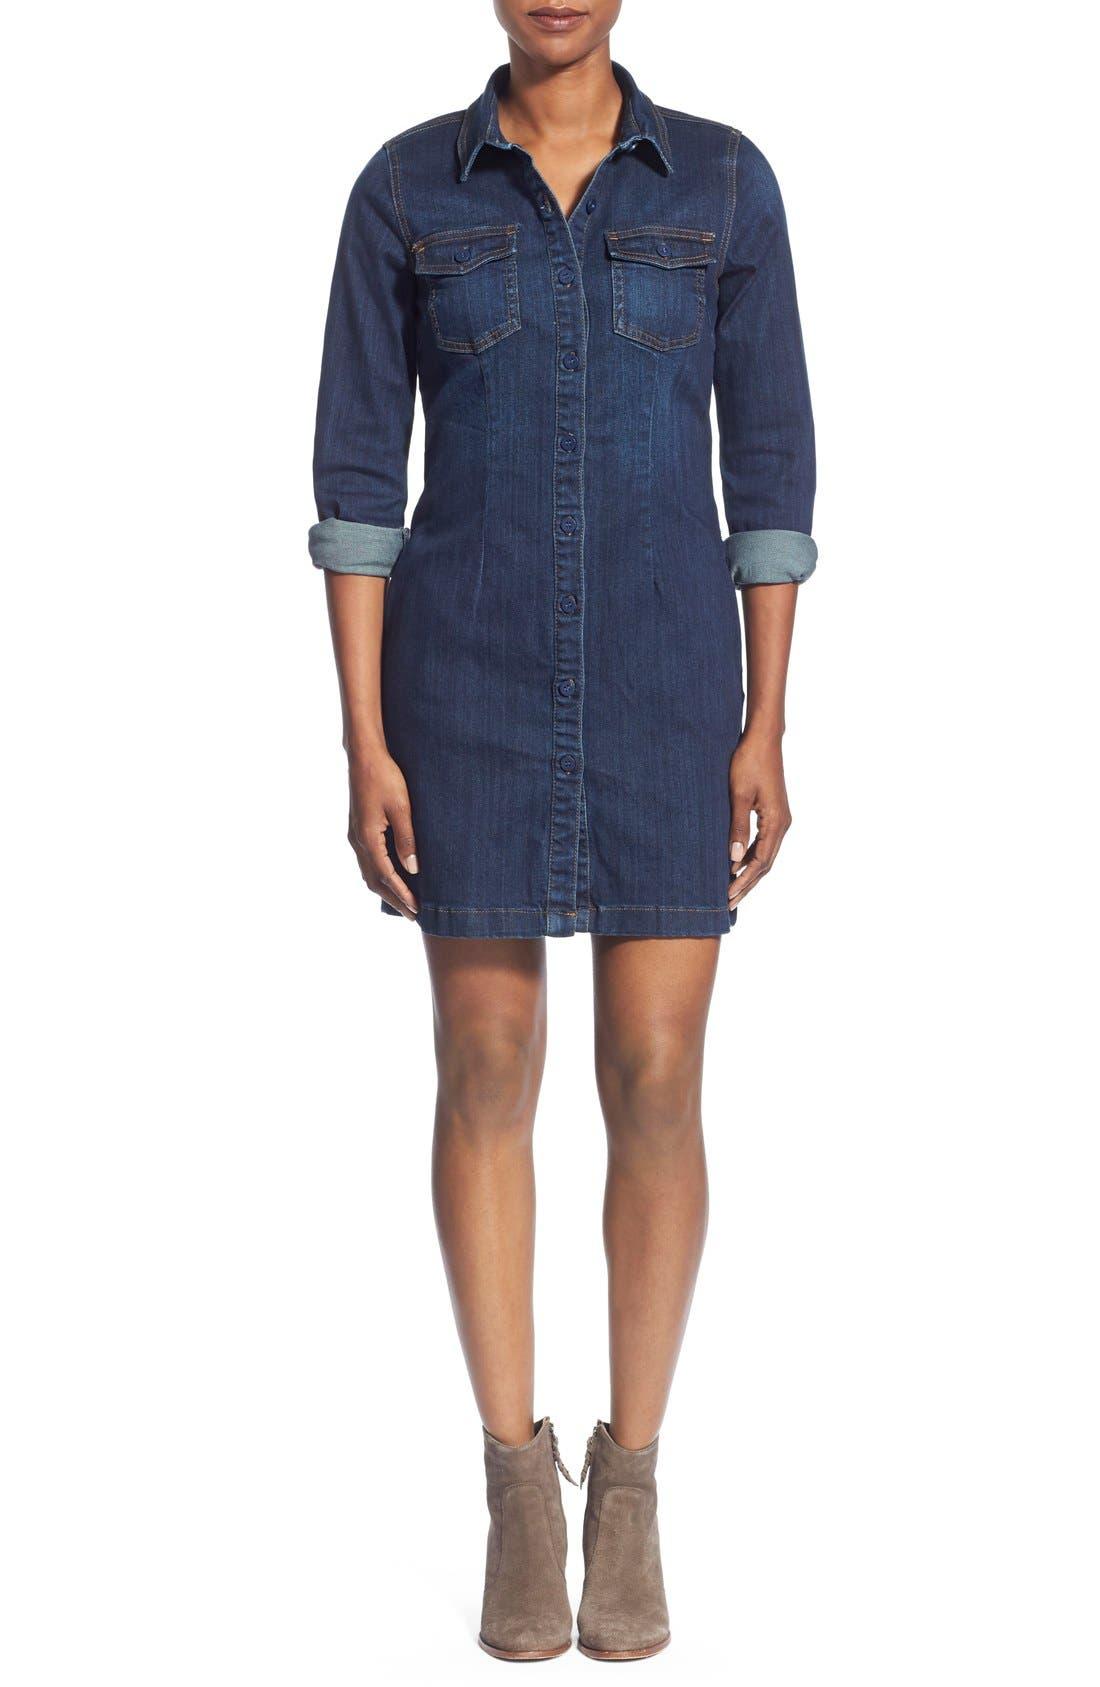 Main Image - KUT from the Kloth 'Blake' Denim Shirt Dress